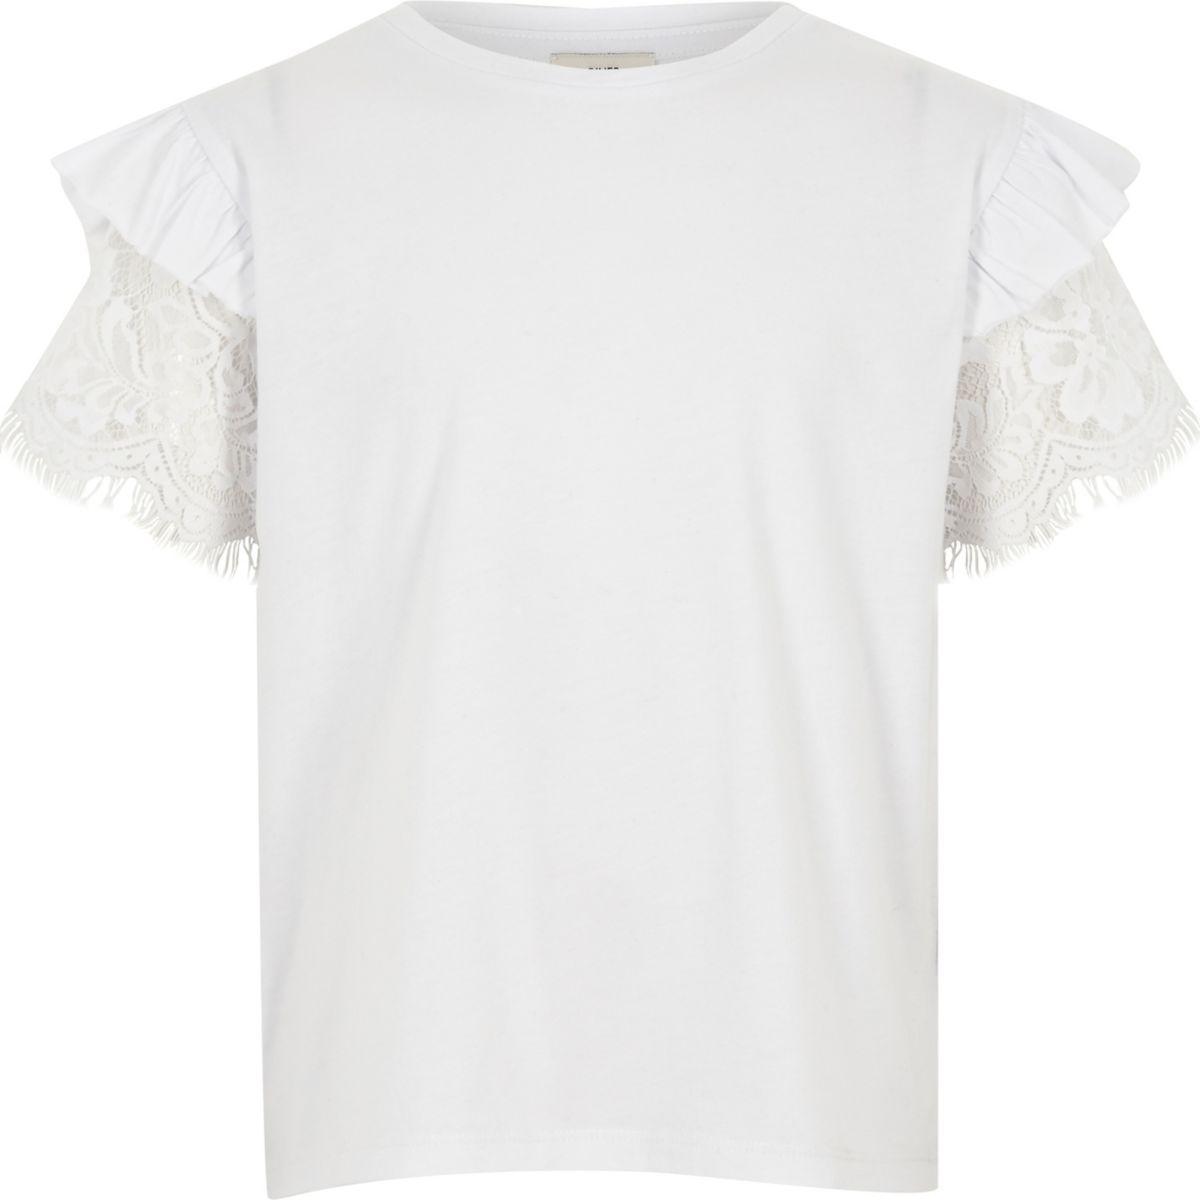 Girls white frill lace short sleeve T-shirt